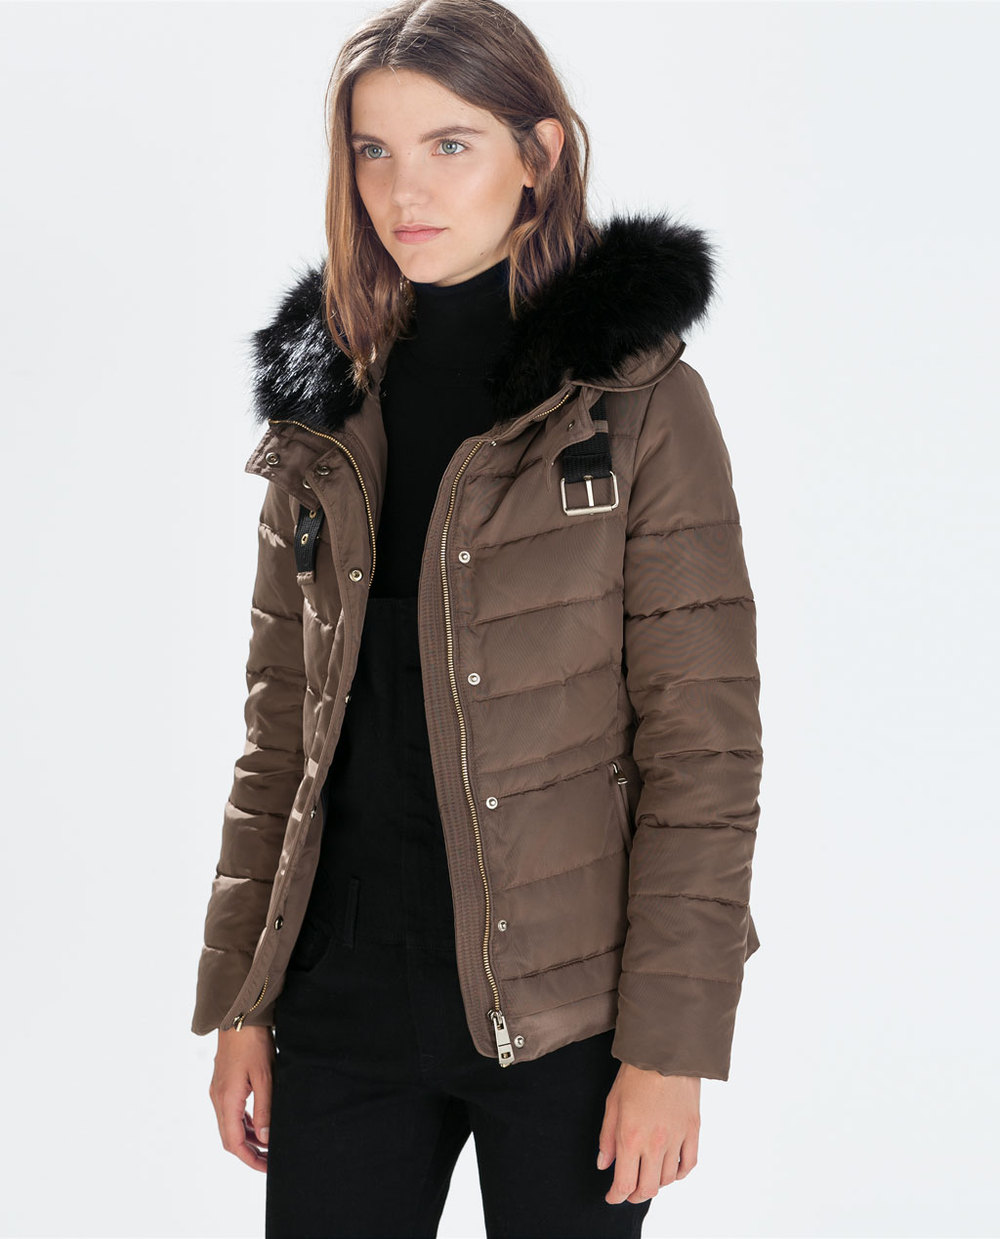 Coat Womens